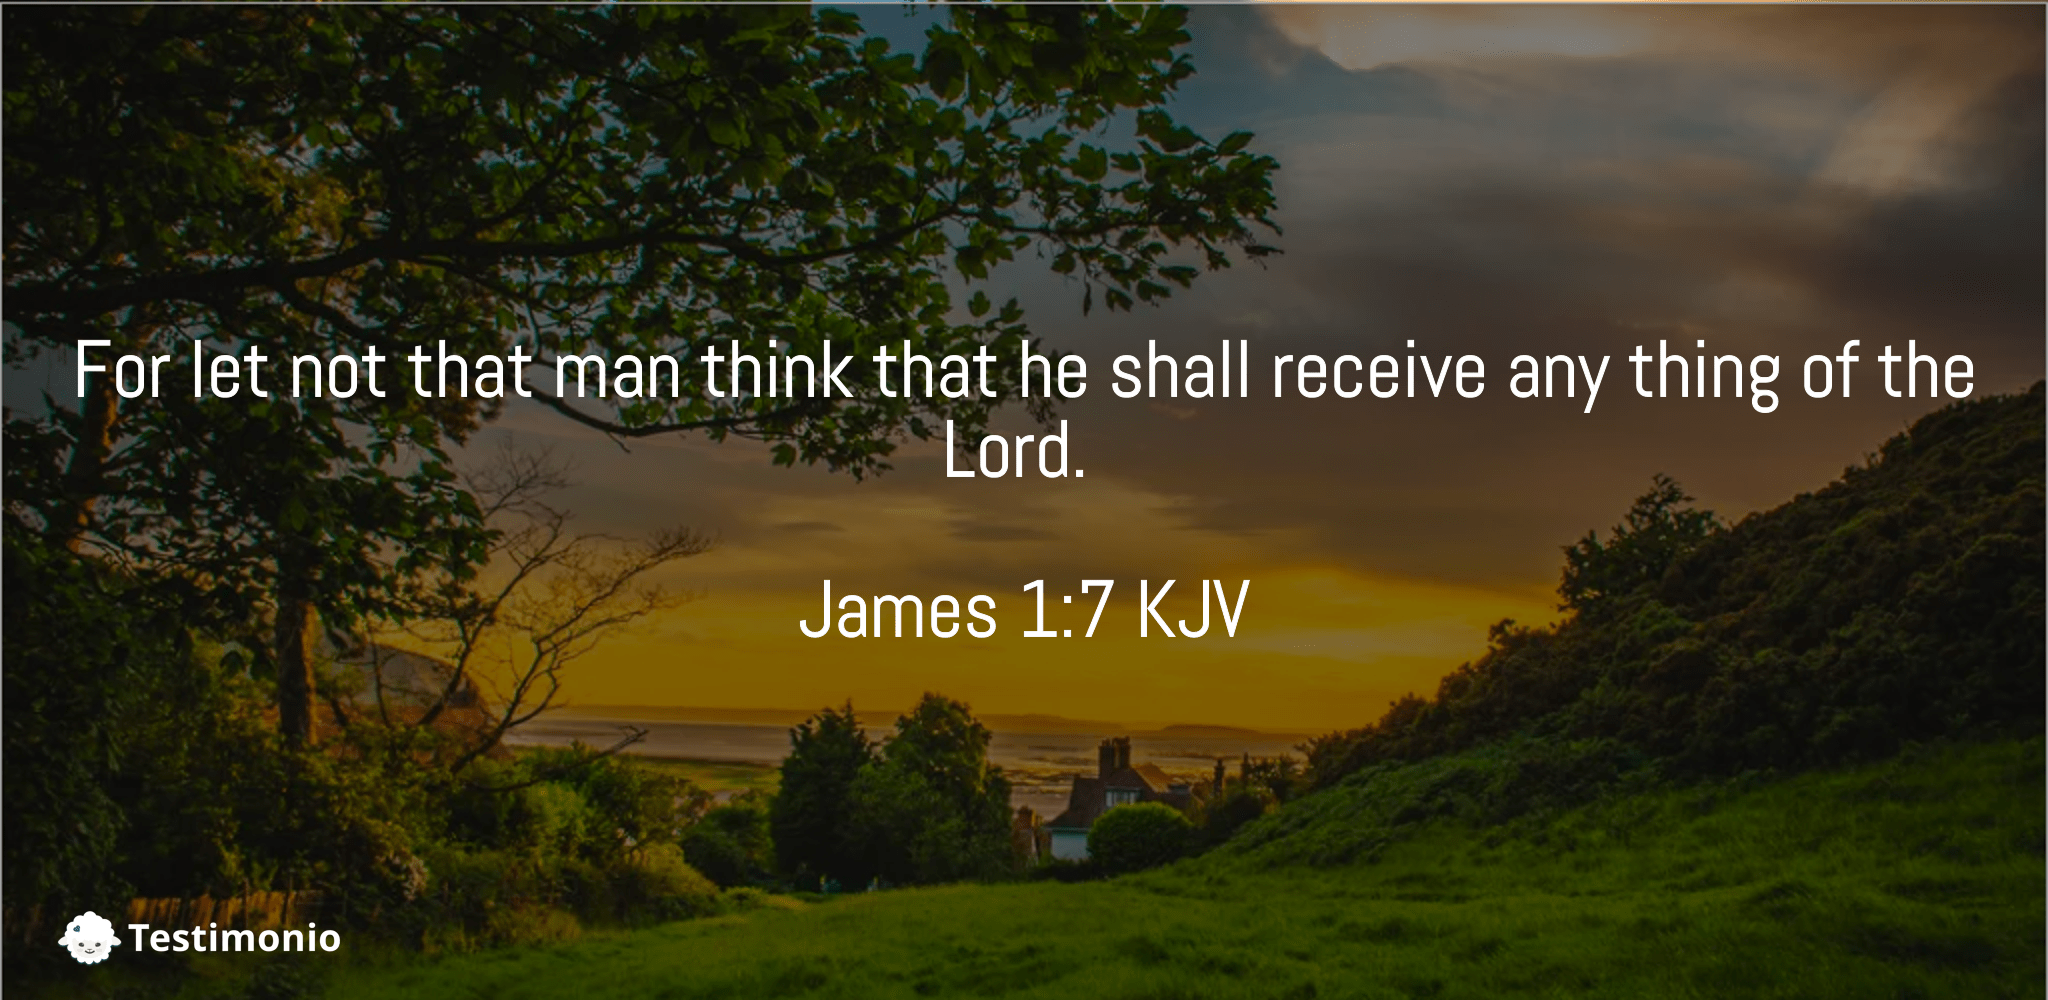 James 1:7